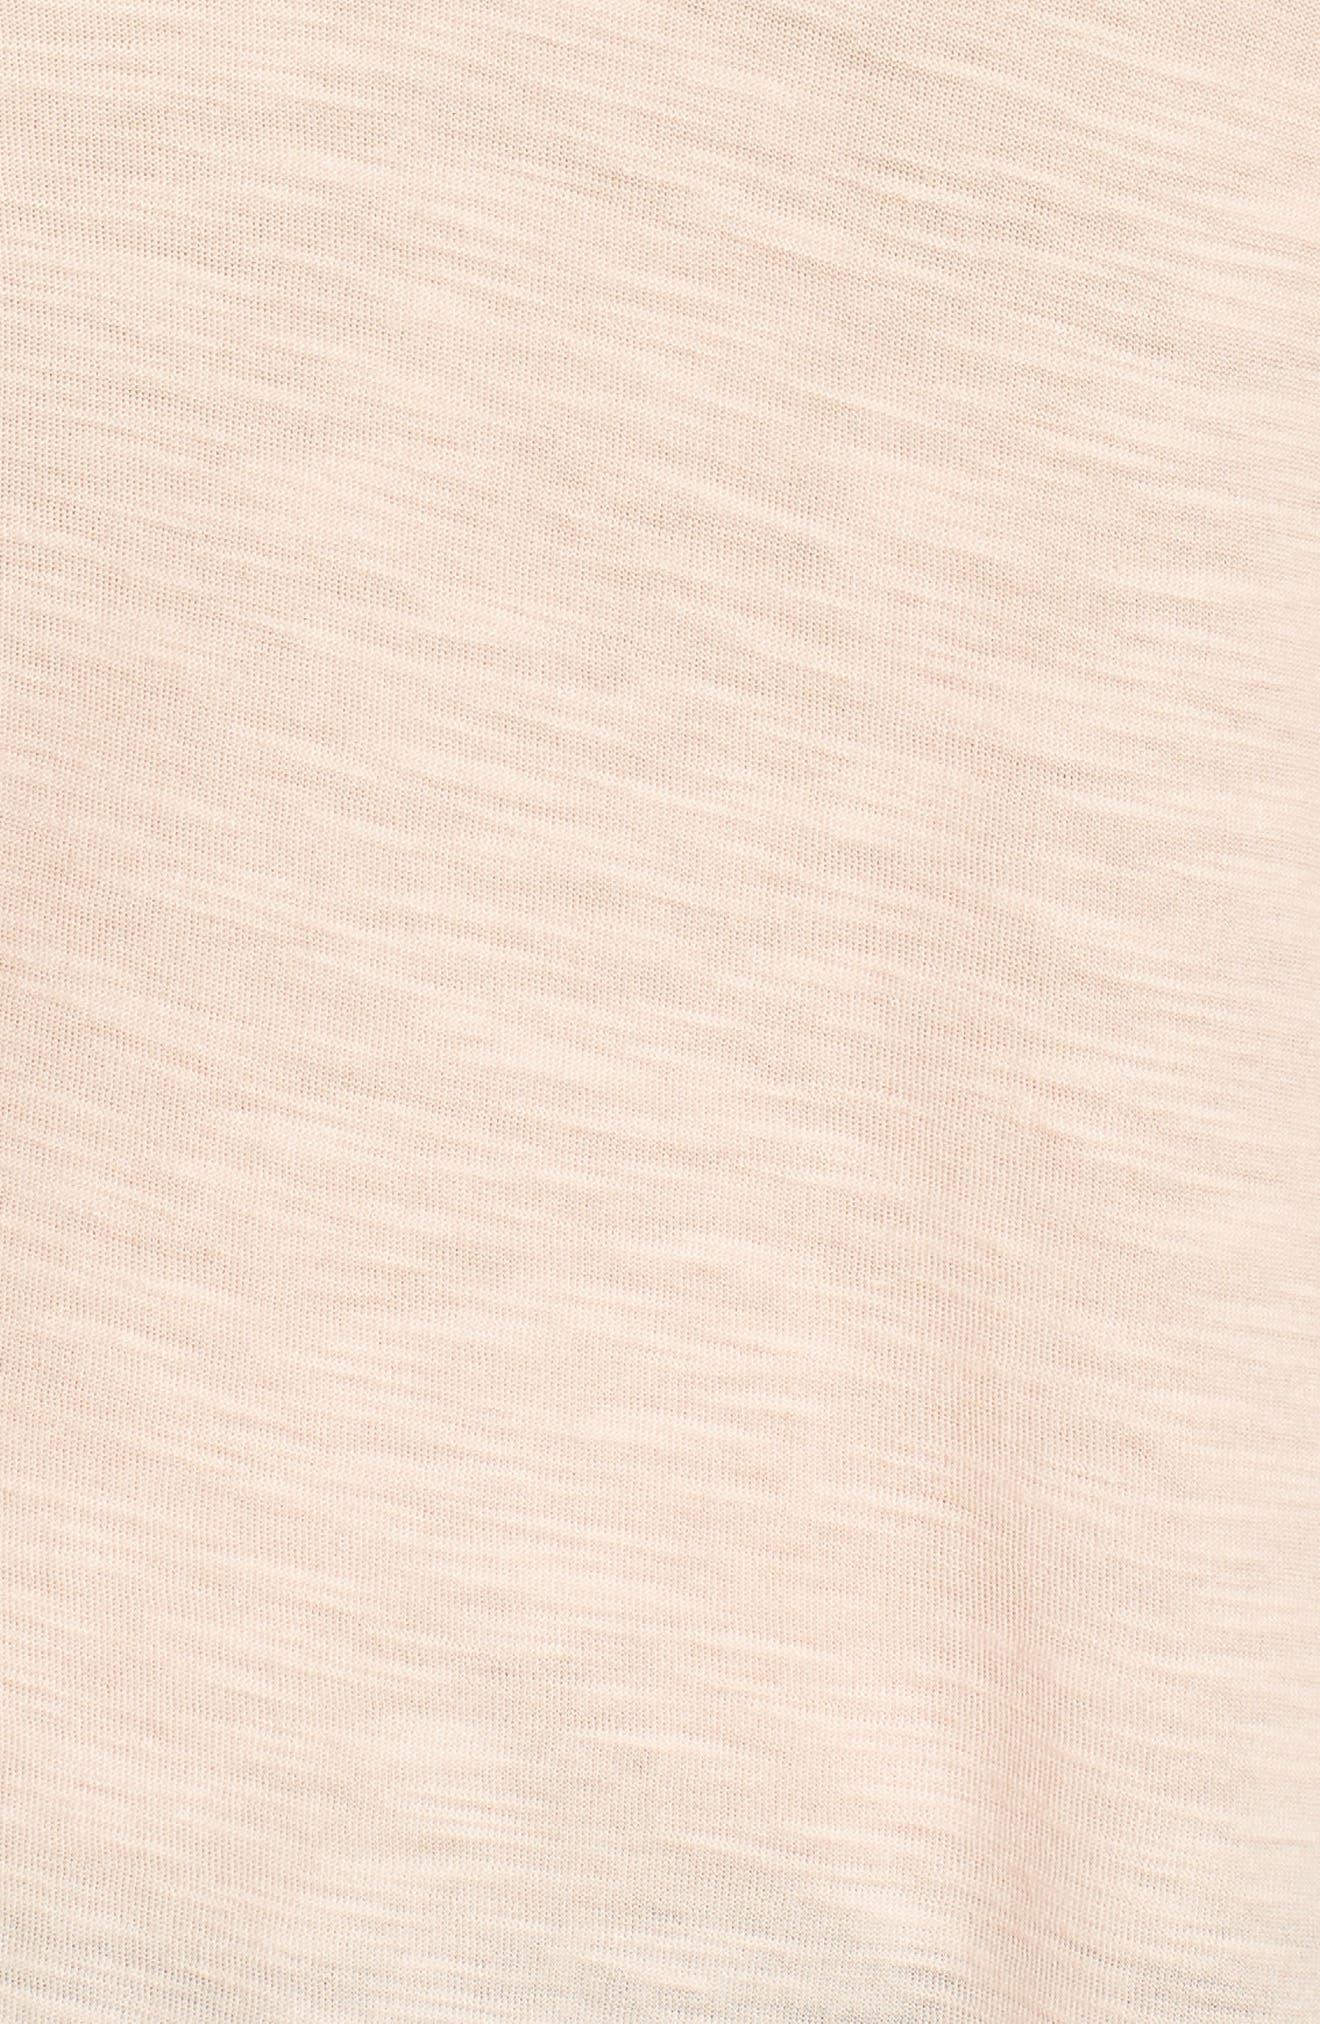 Ruffle Sleeve Mixed Media Top,                             Alternate thumbnail 6, color,                             885